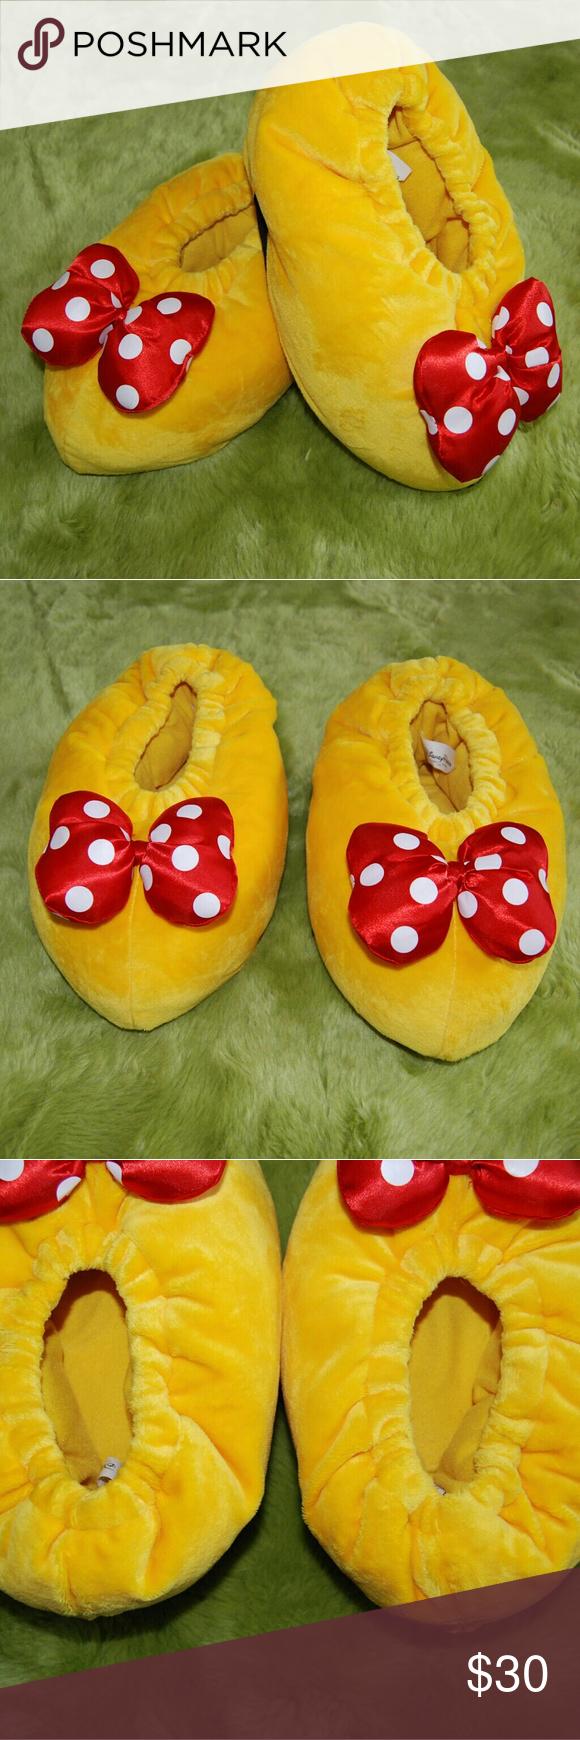 022b8e841ff4 Disney Minnie Mouse Yellow Plush Slippers Adult M Yellow soft plush  slippers Disney parks Good condition Gently worn Adult medium Disney Shoes  Slippers